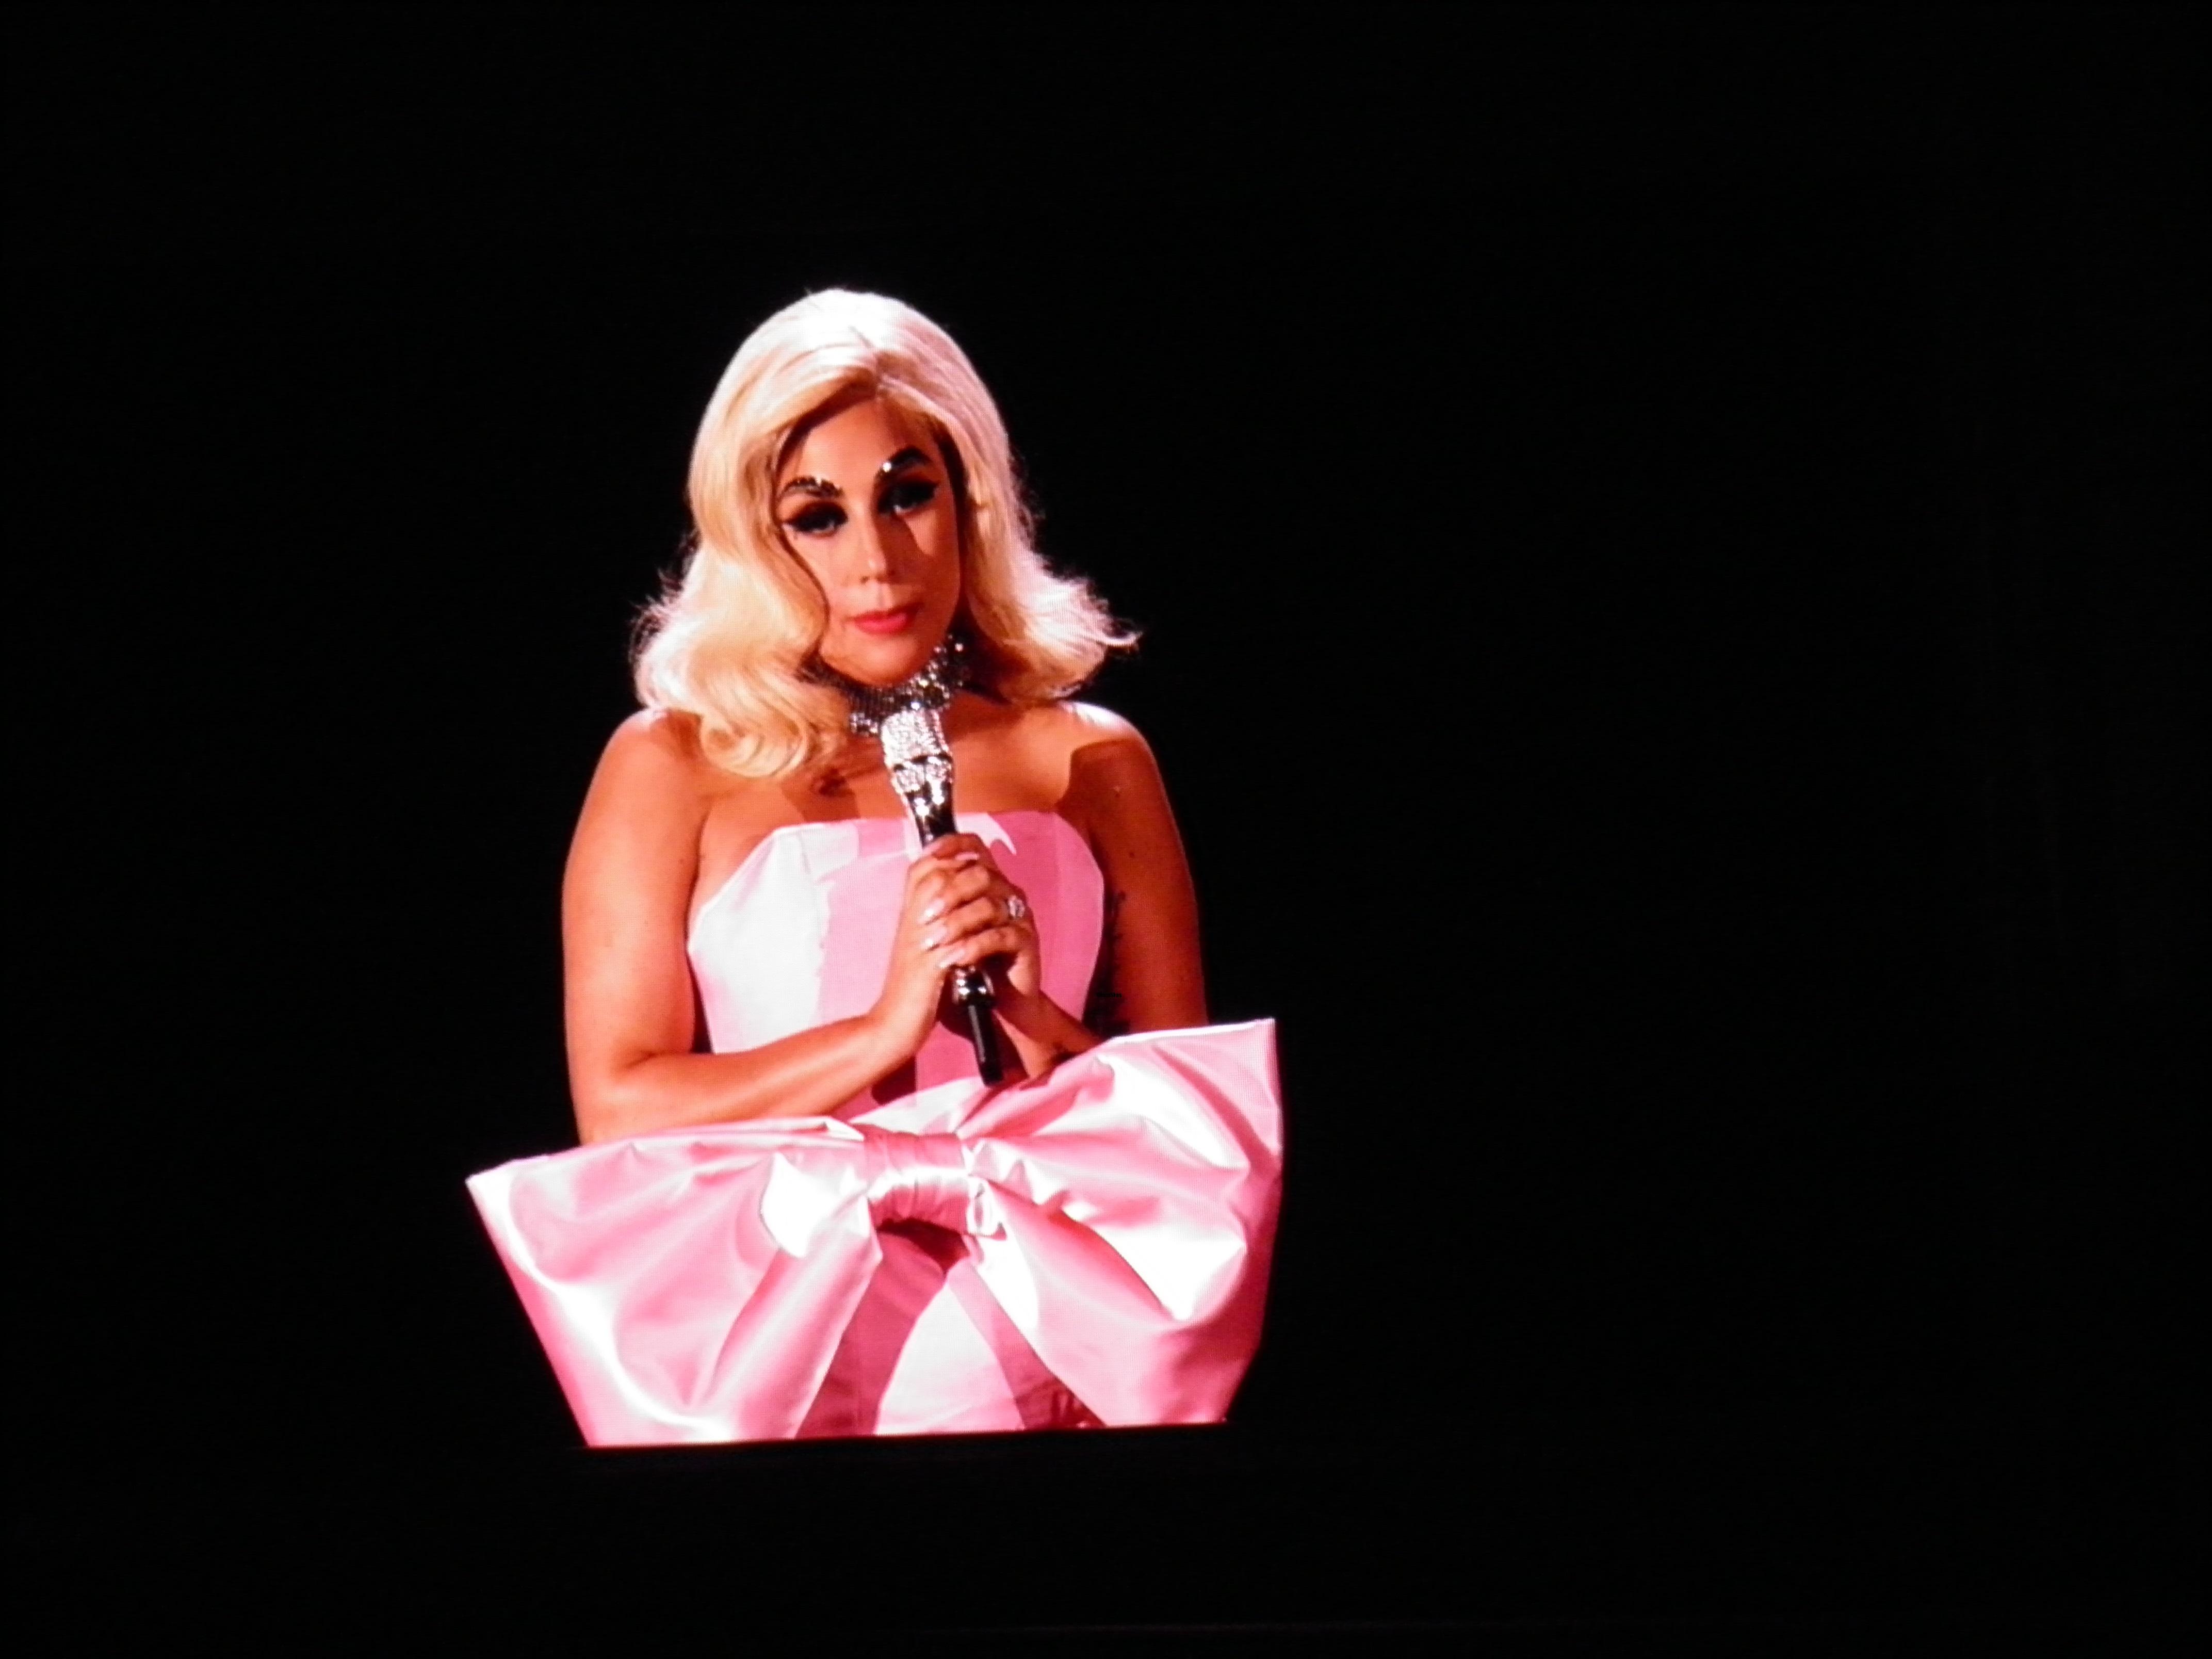 Lady Gaga canta clássico de Édith Piaf